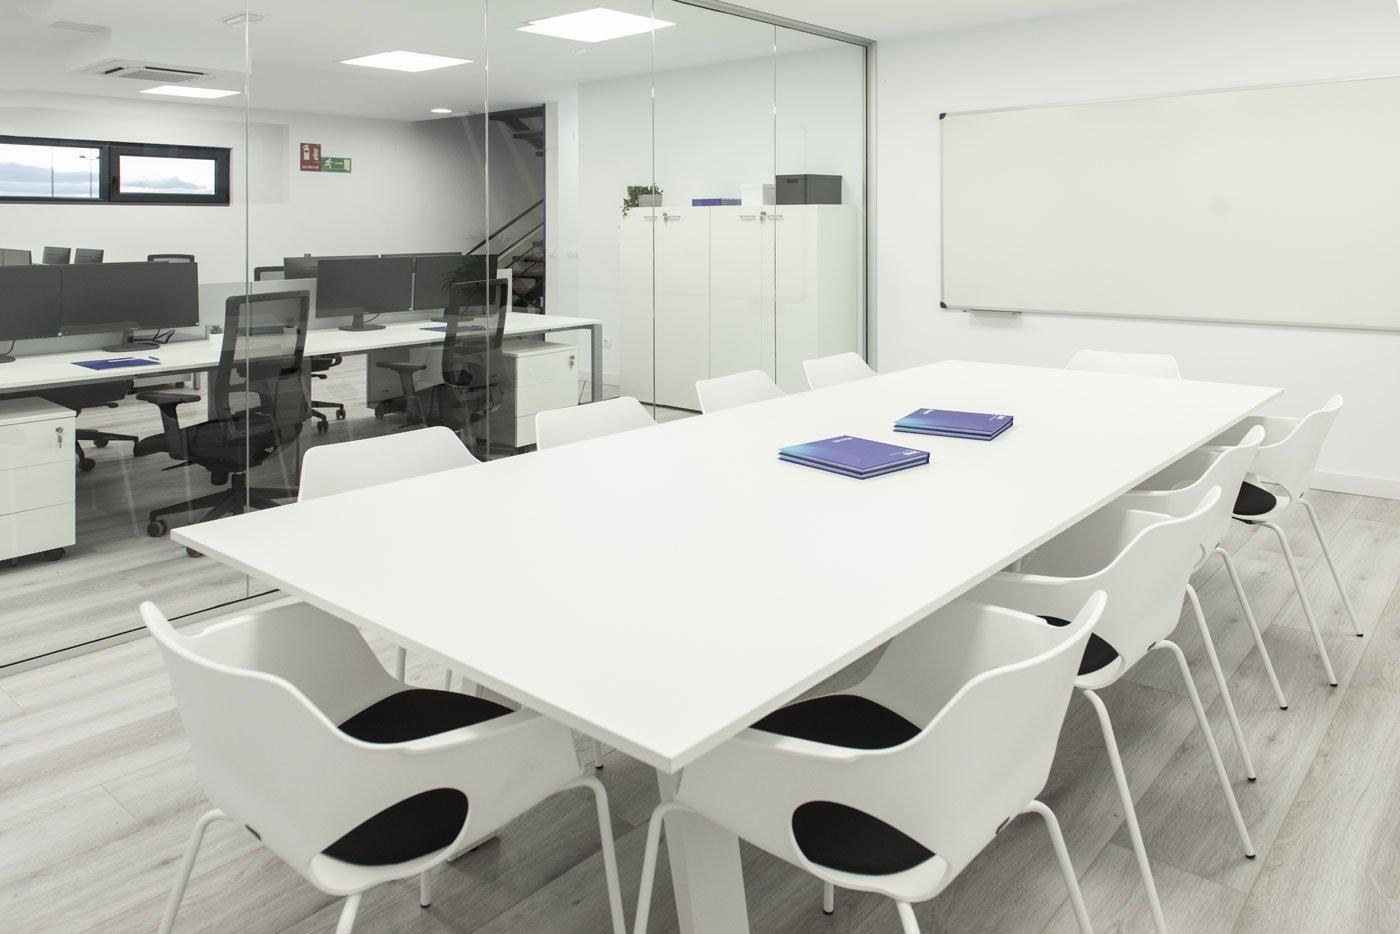 Sala de reuniones Eurotransac Grupo Alonso